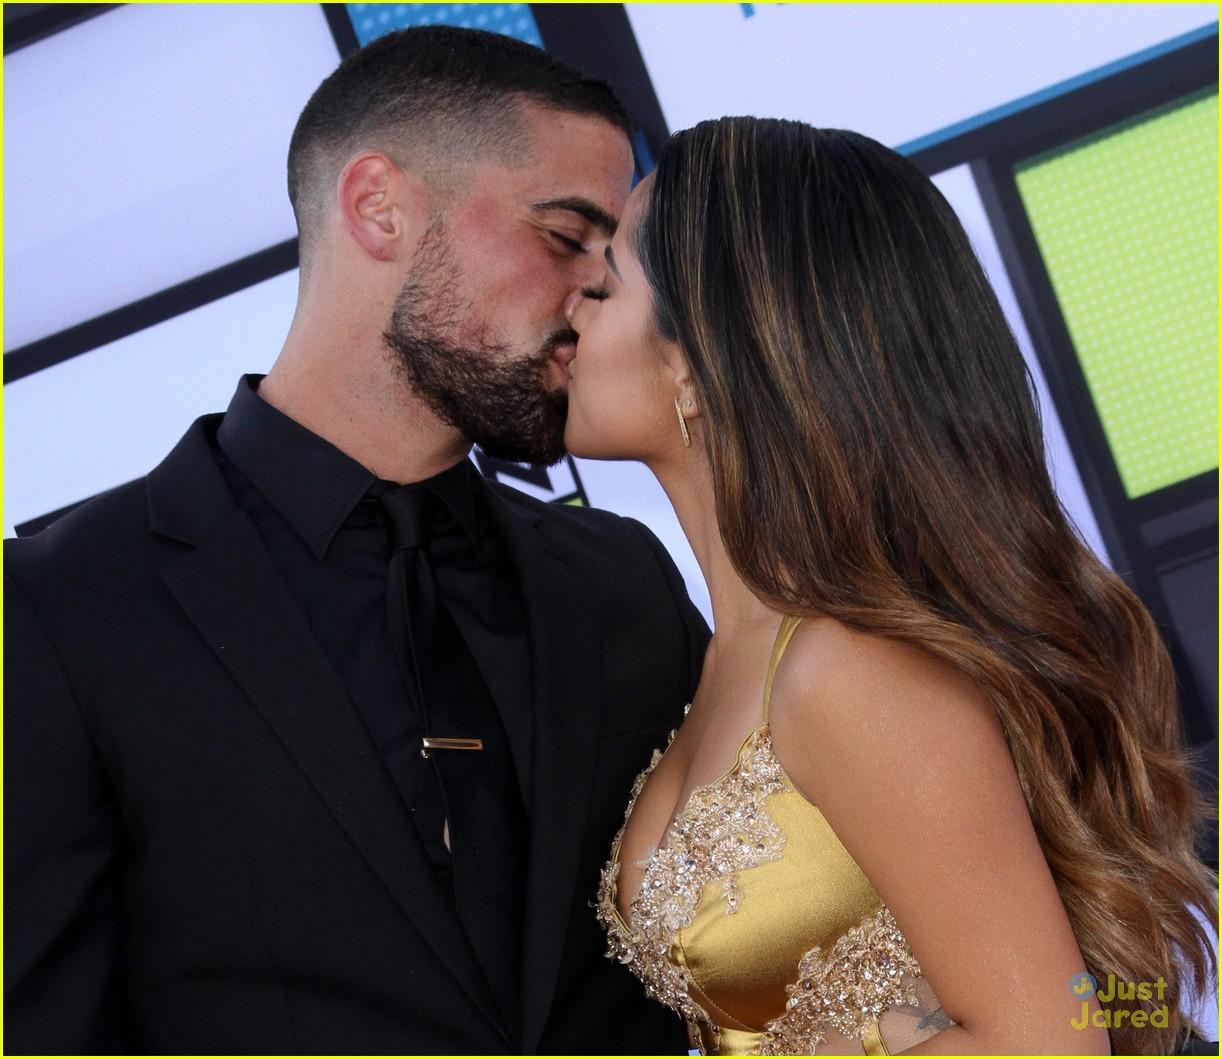 http://cdn01.cdn.justjaredjr.com/wp-content/uploads/2016/10/becky-seb/becky-g-sebastian-lletget-kiss-latin-amas-12.jpg